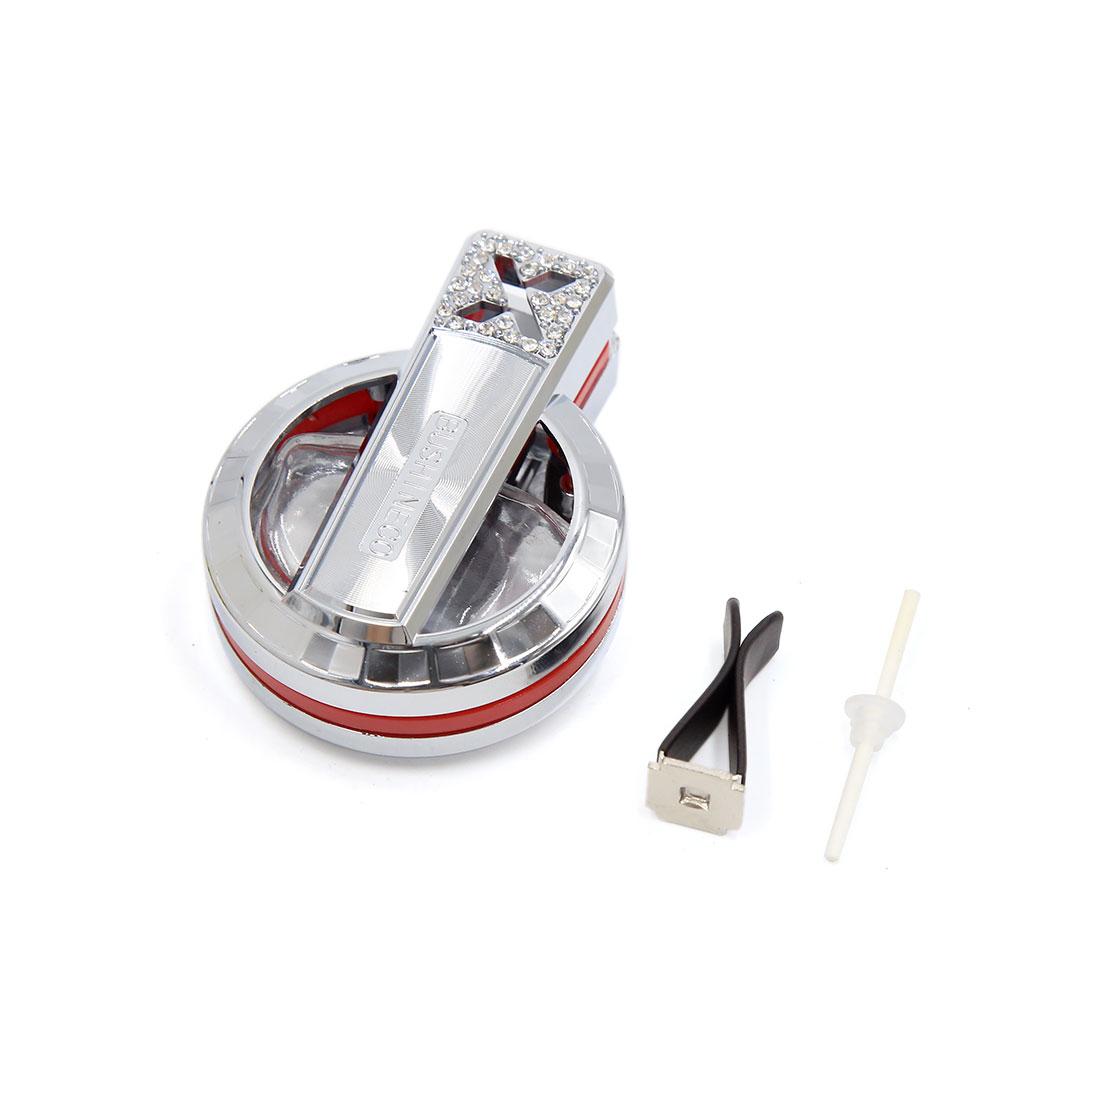 Universal Silver Tone Car Air Vent Perfume Bottle Fragrance Diffuser Freshener Base